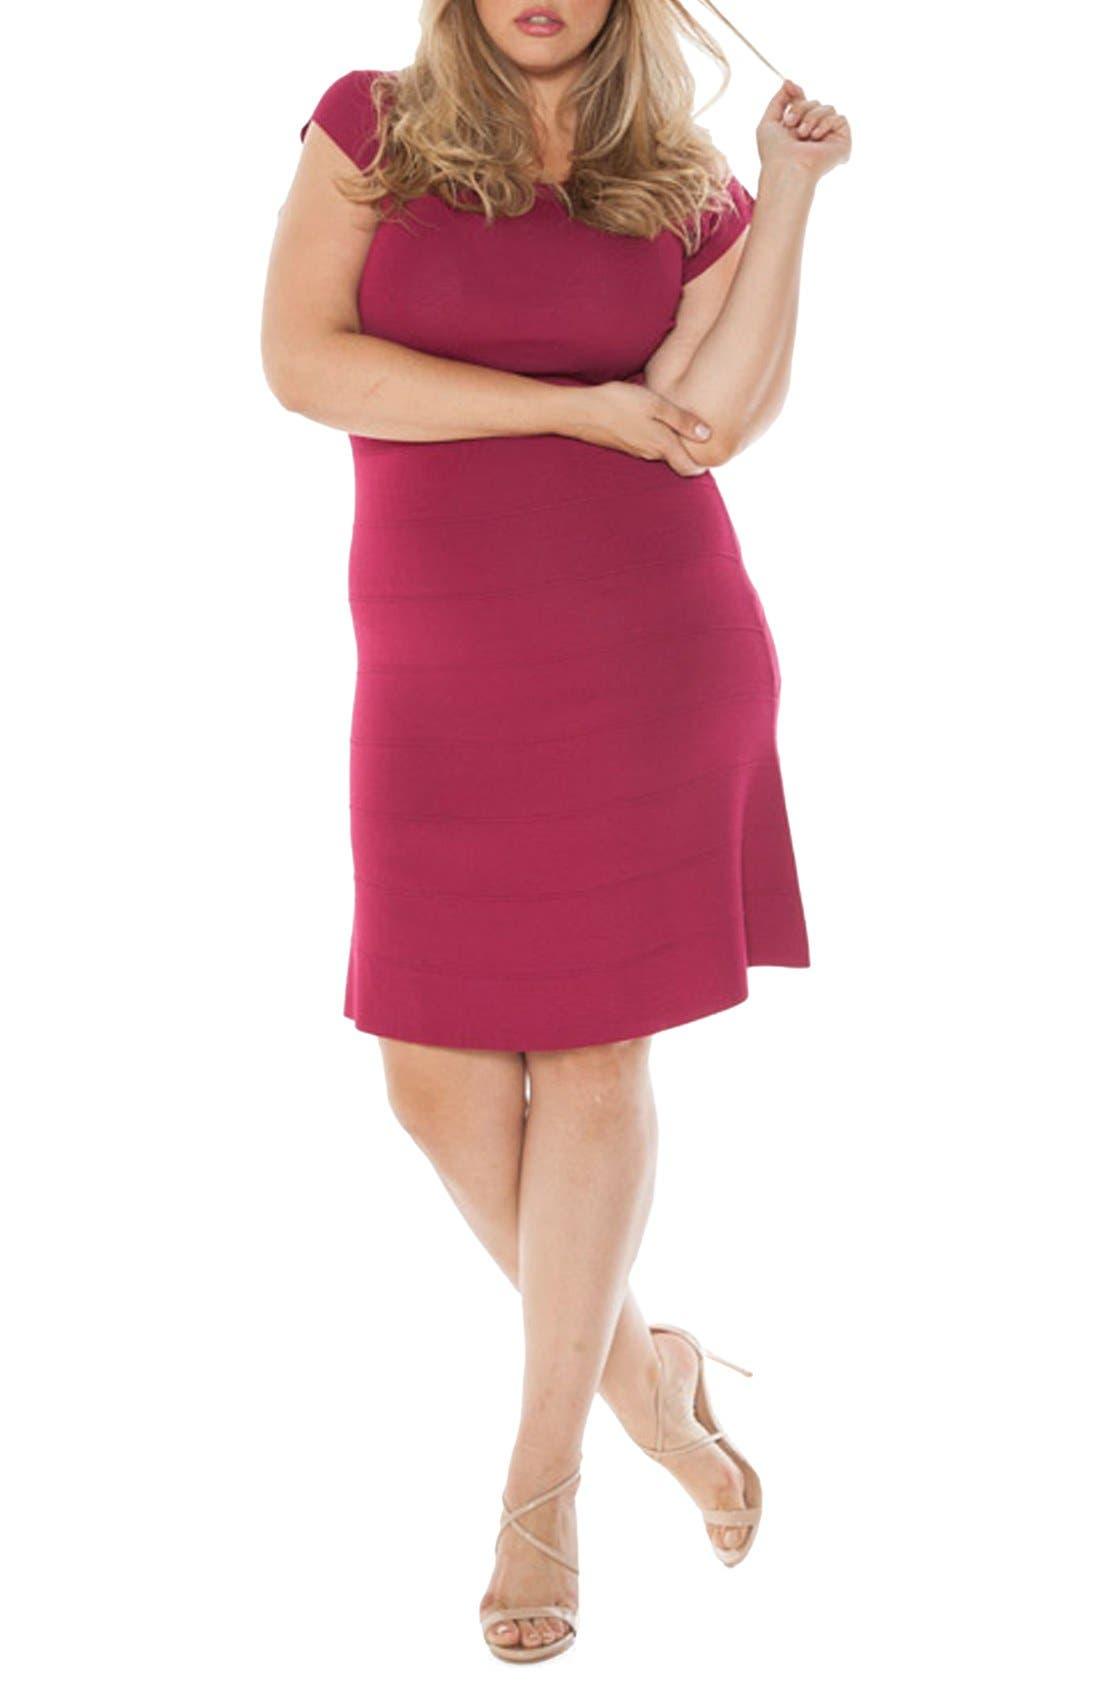 Alternate Image 1 Selected - SLINK Jeans Cap Sleeve Knit A-Line Dress (Plus Size)